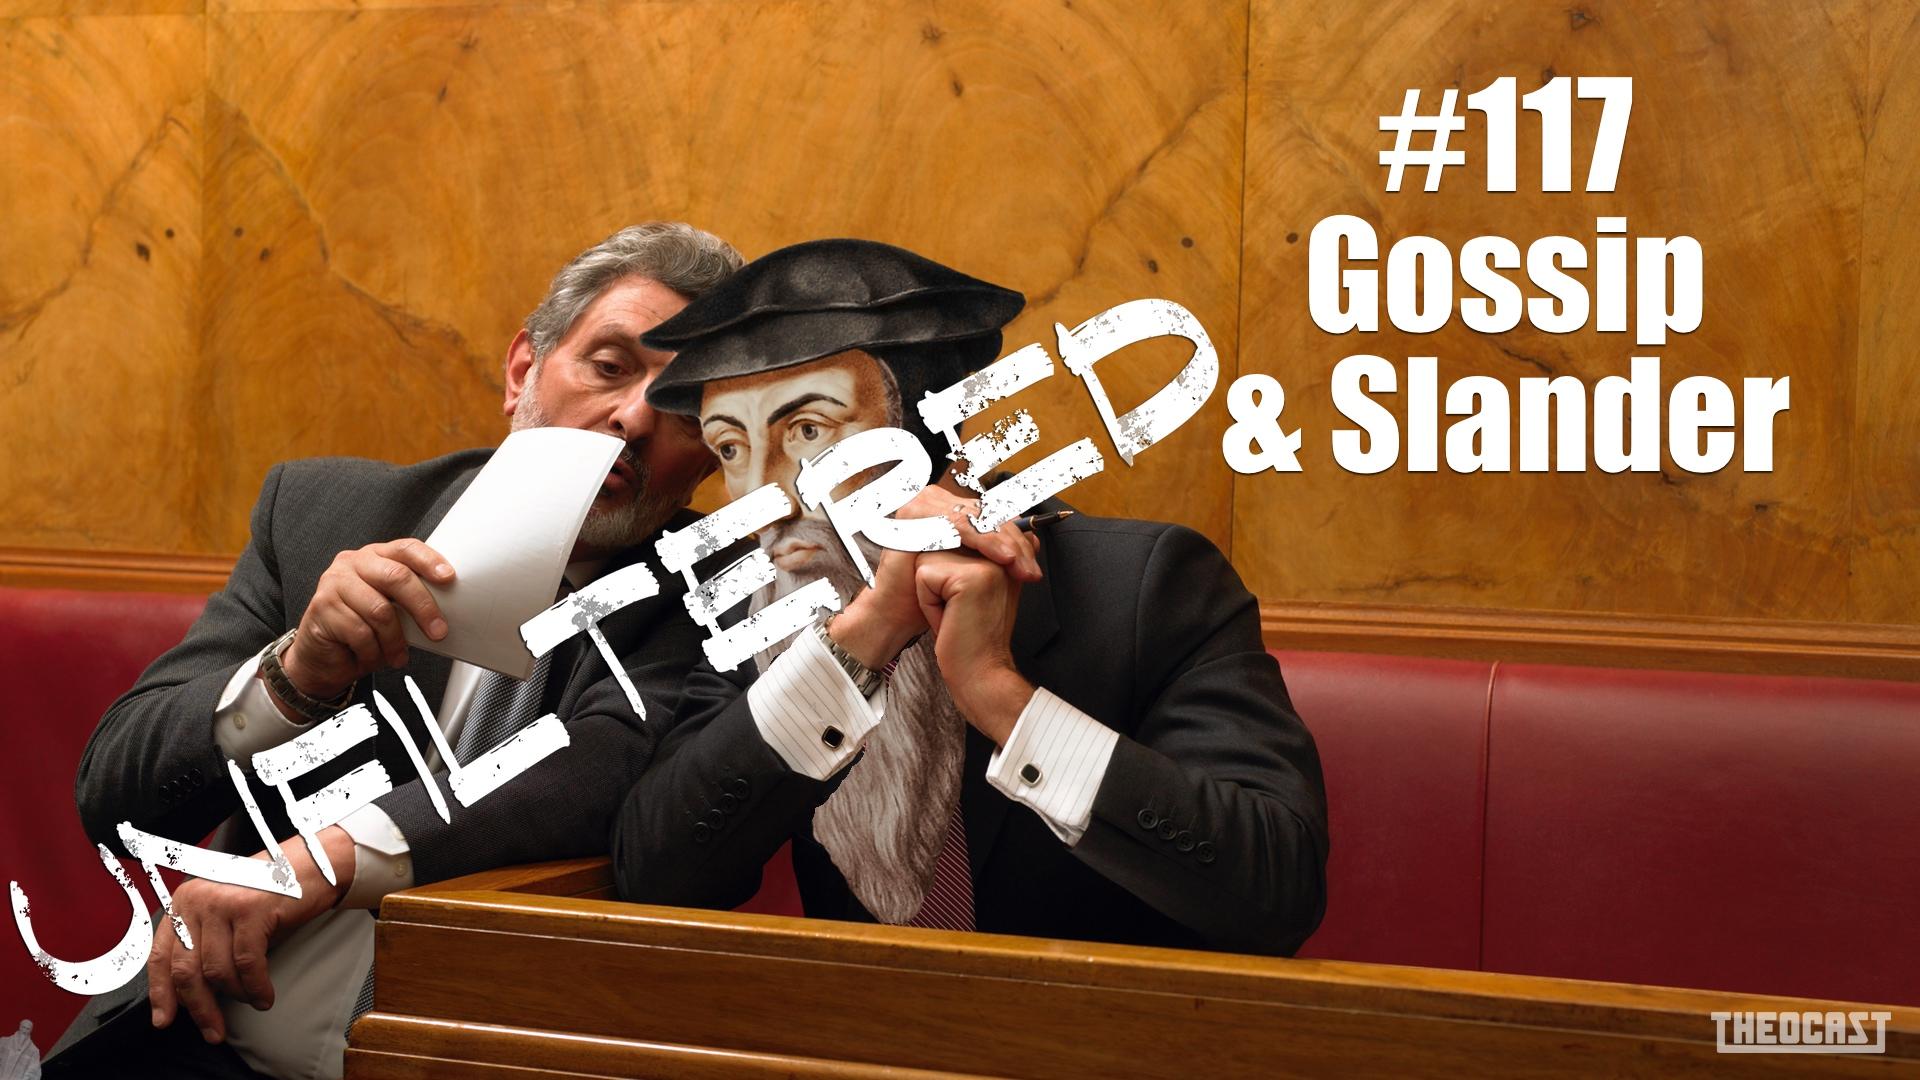 UNFILTERED #117 Gossip & Slander